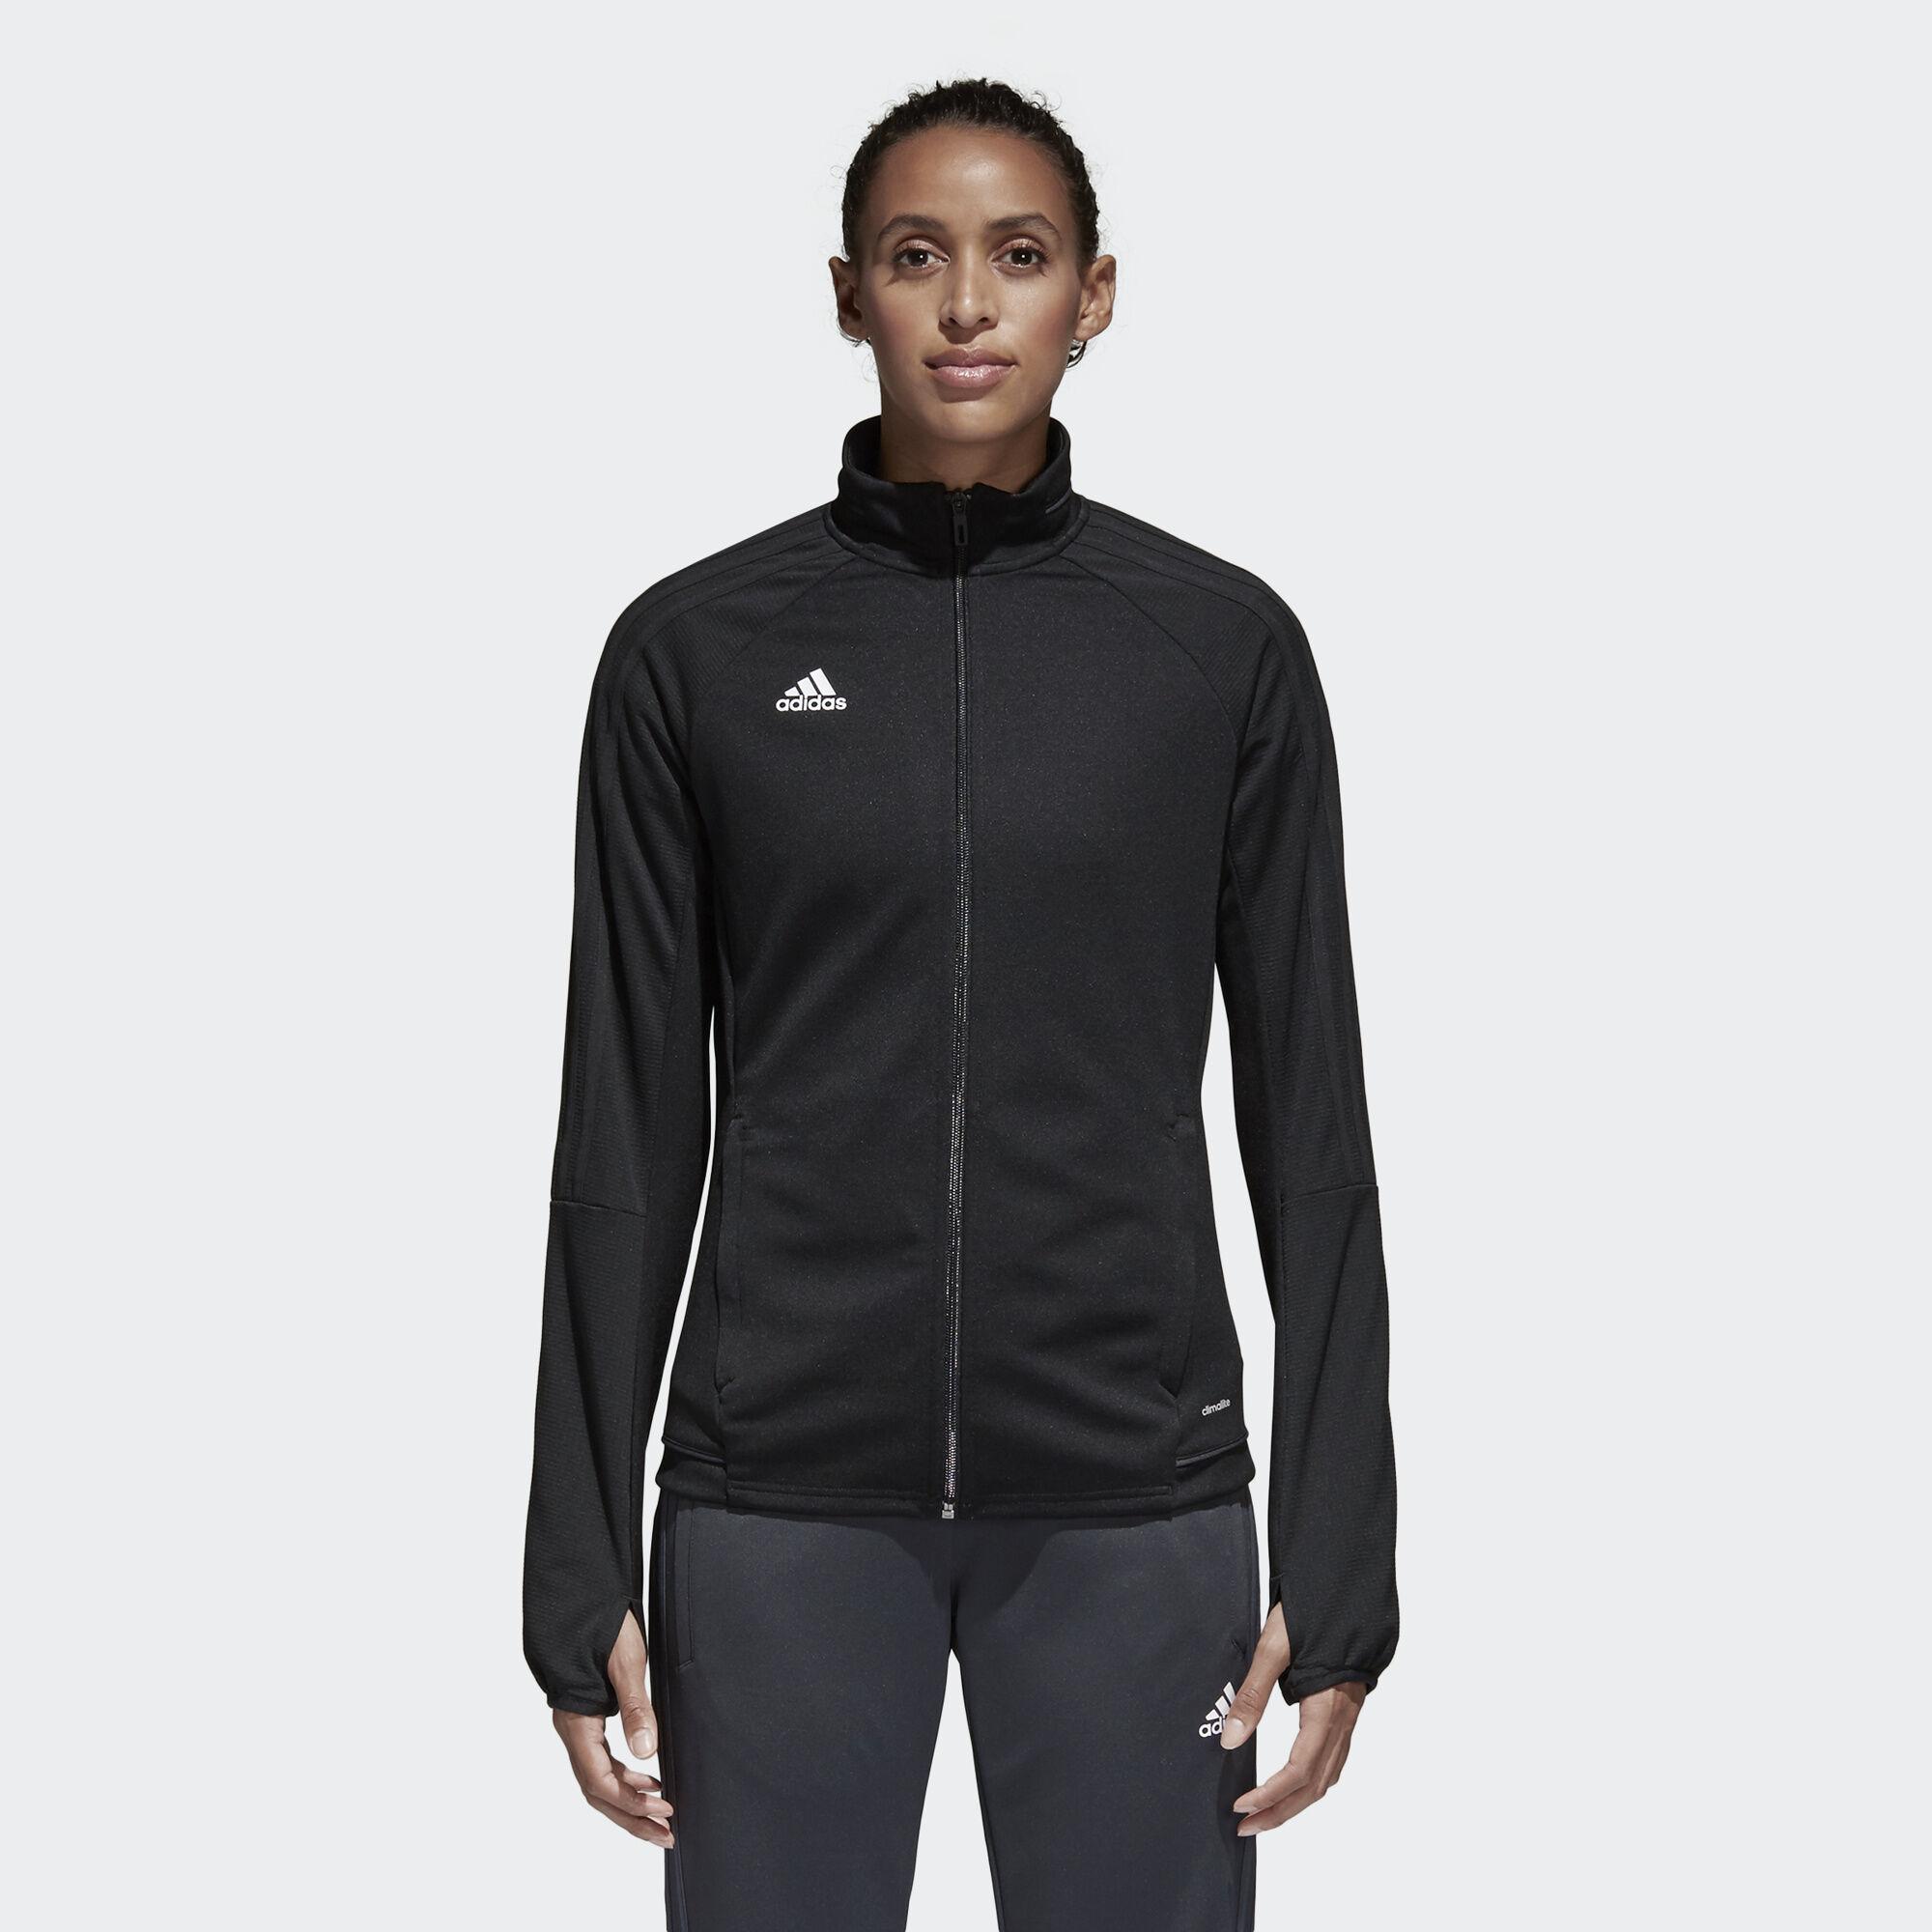 Adidas Tiro 17 Training Jacket Black Adidas Us